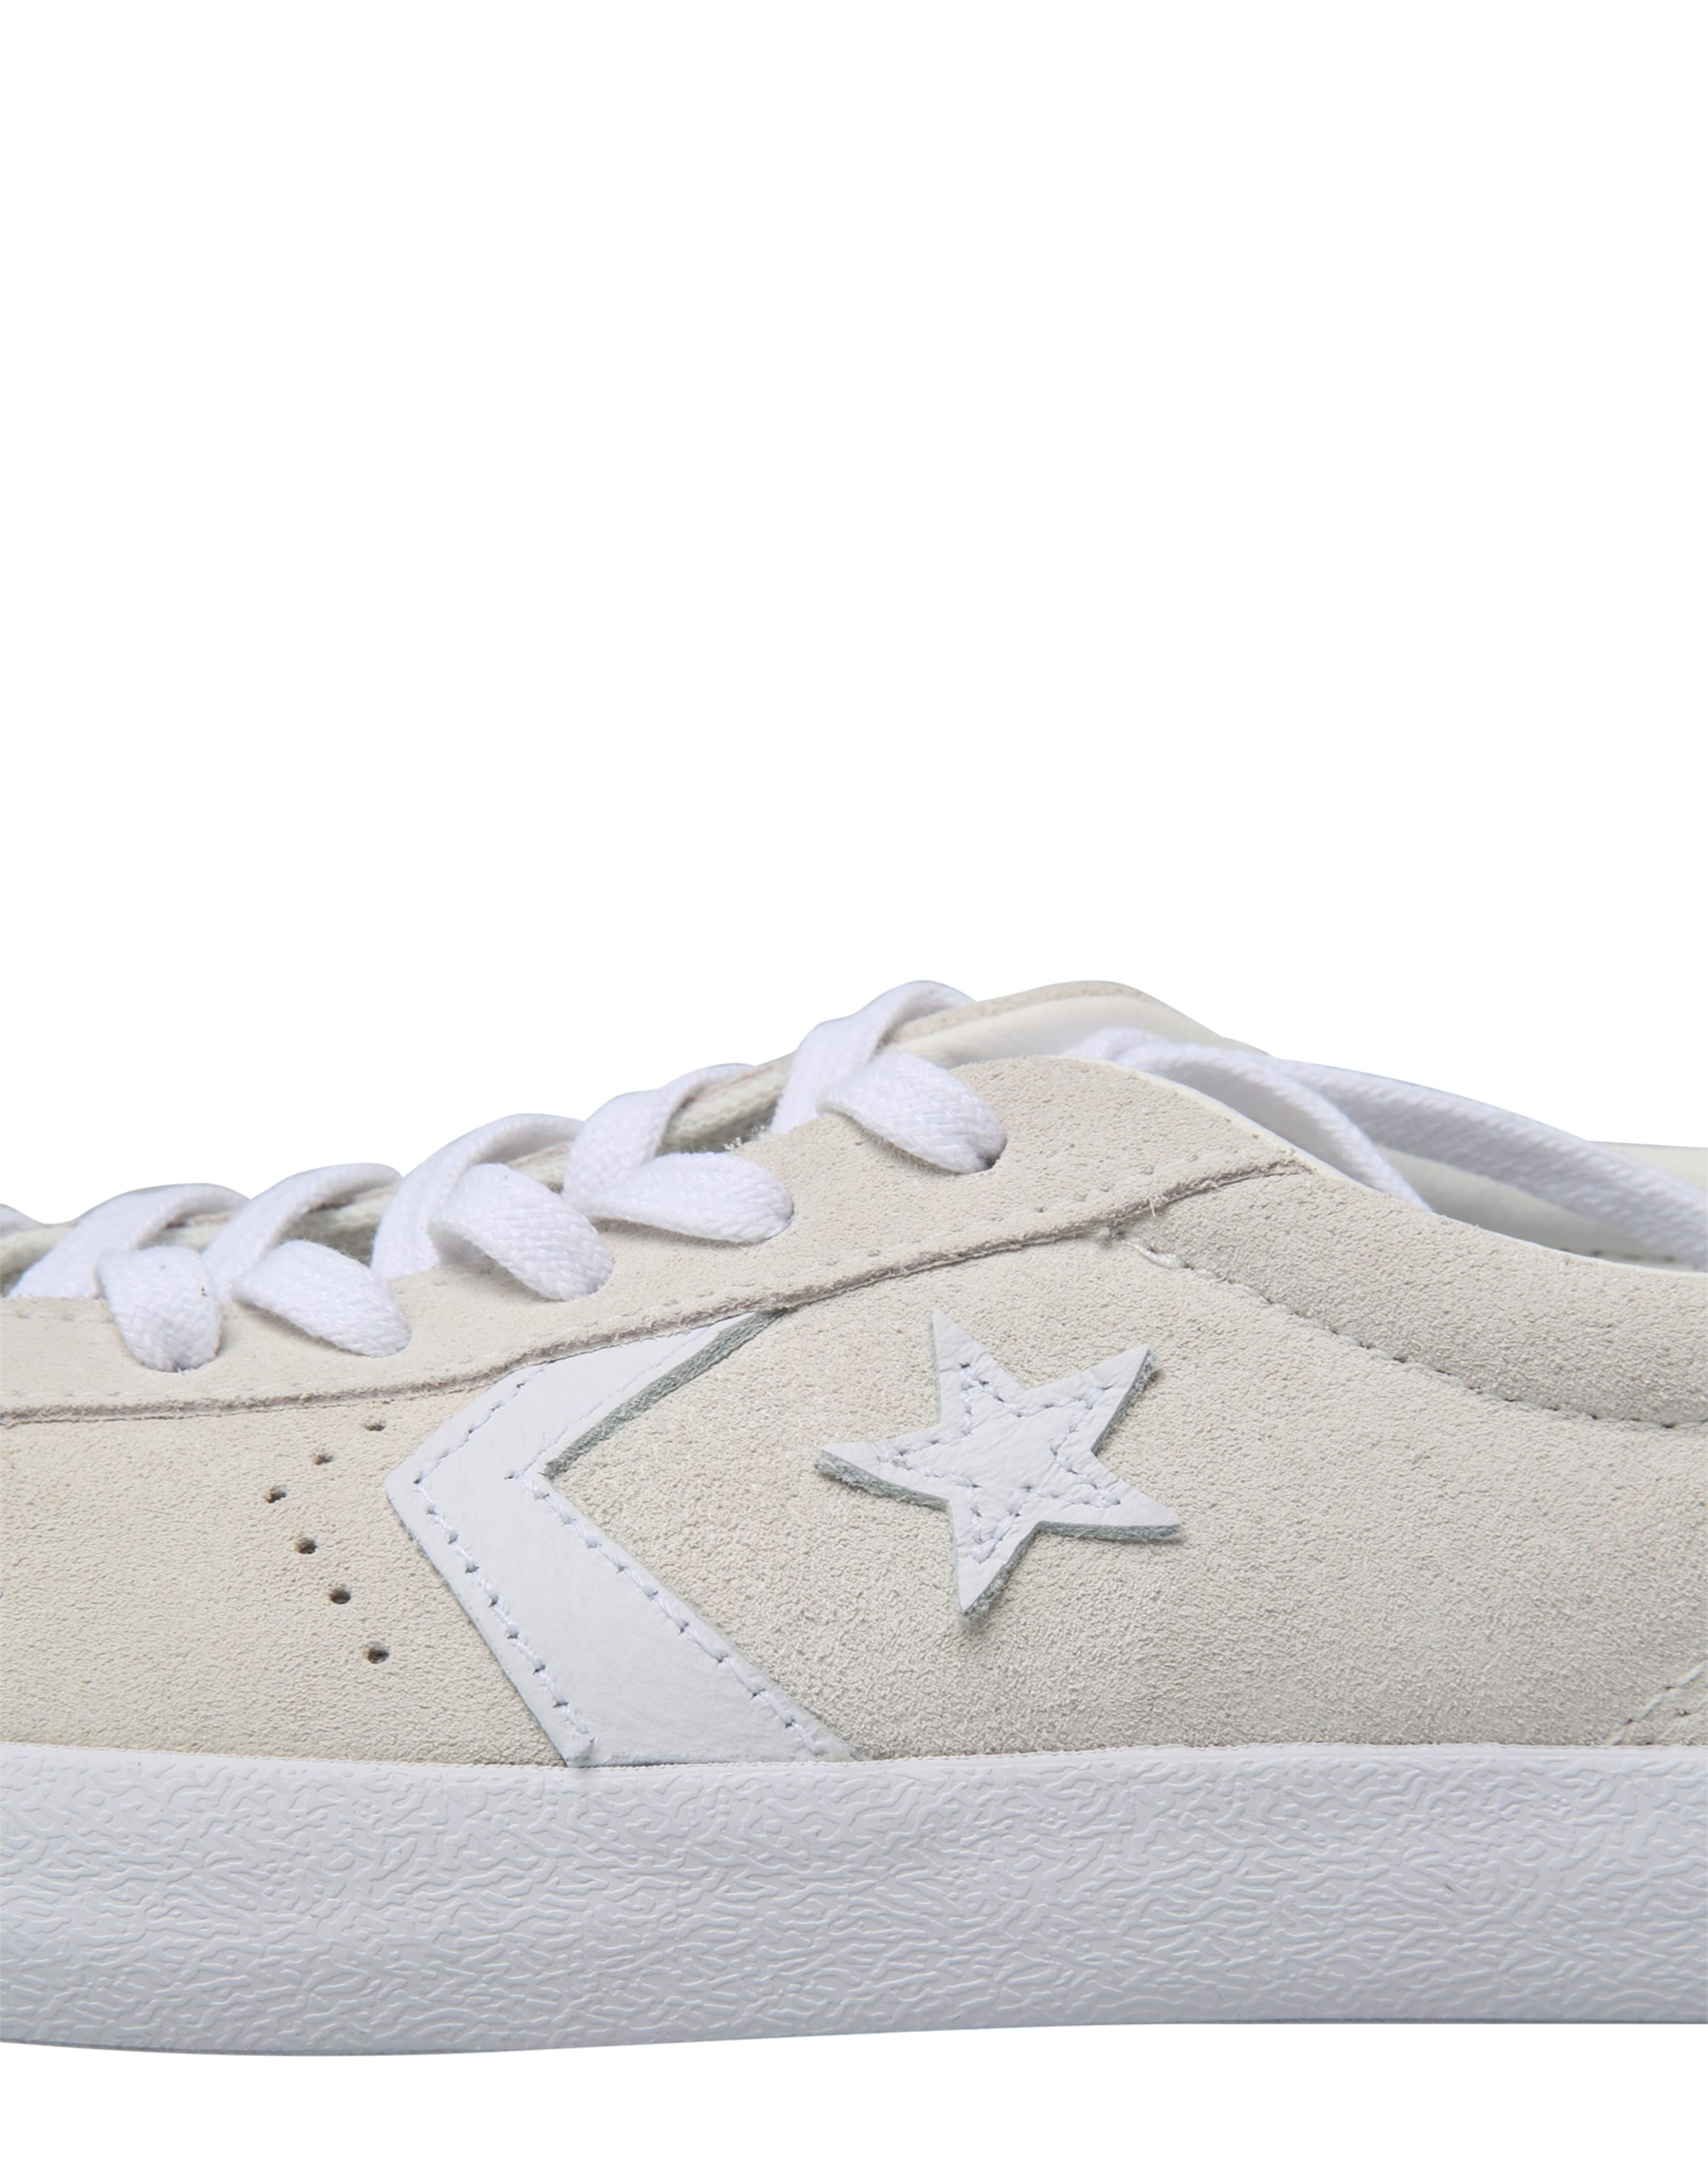 'breakpoint' In Sneakers Converse Creme kPXn0w8O